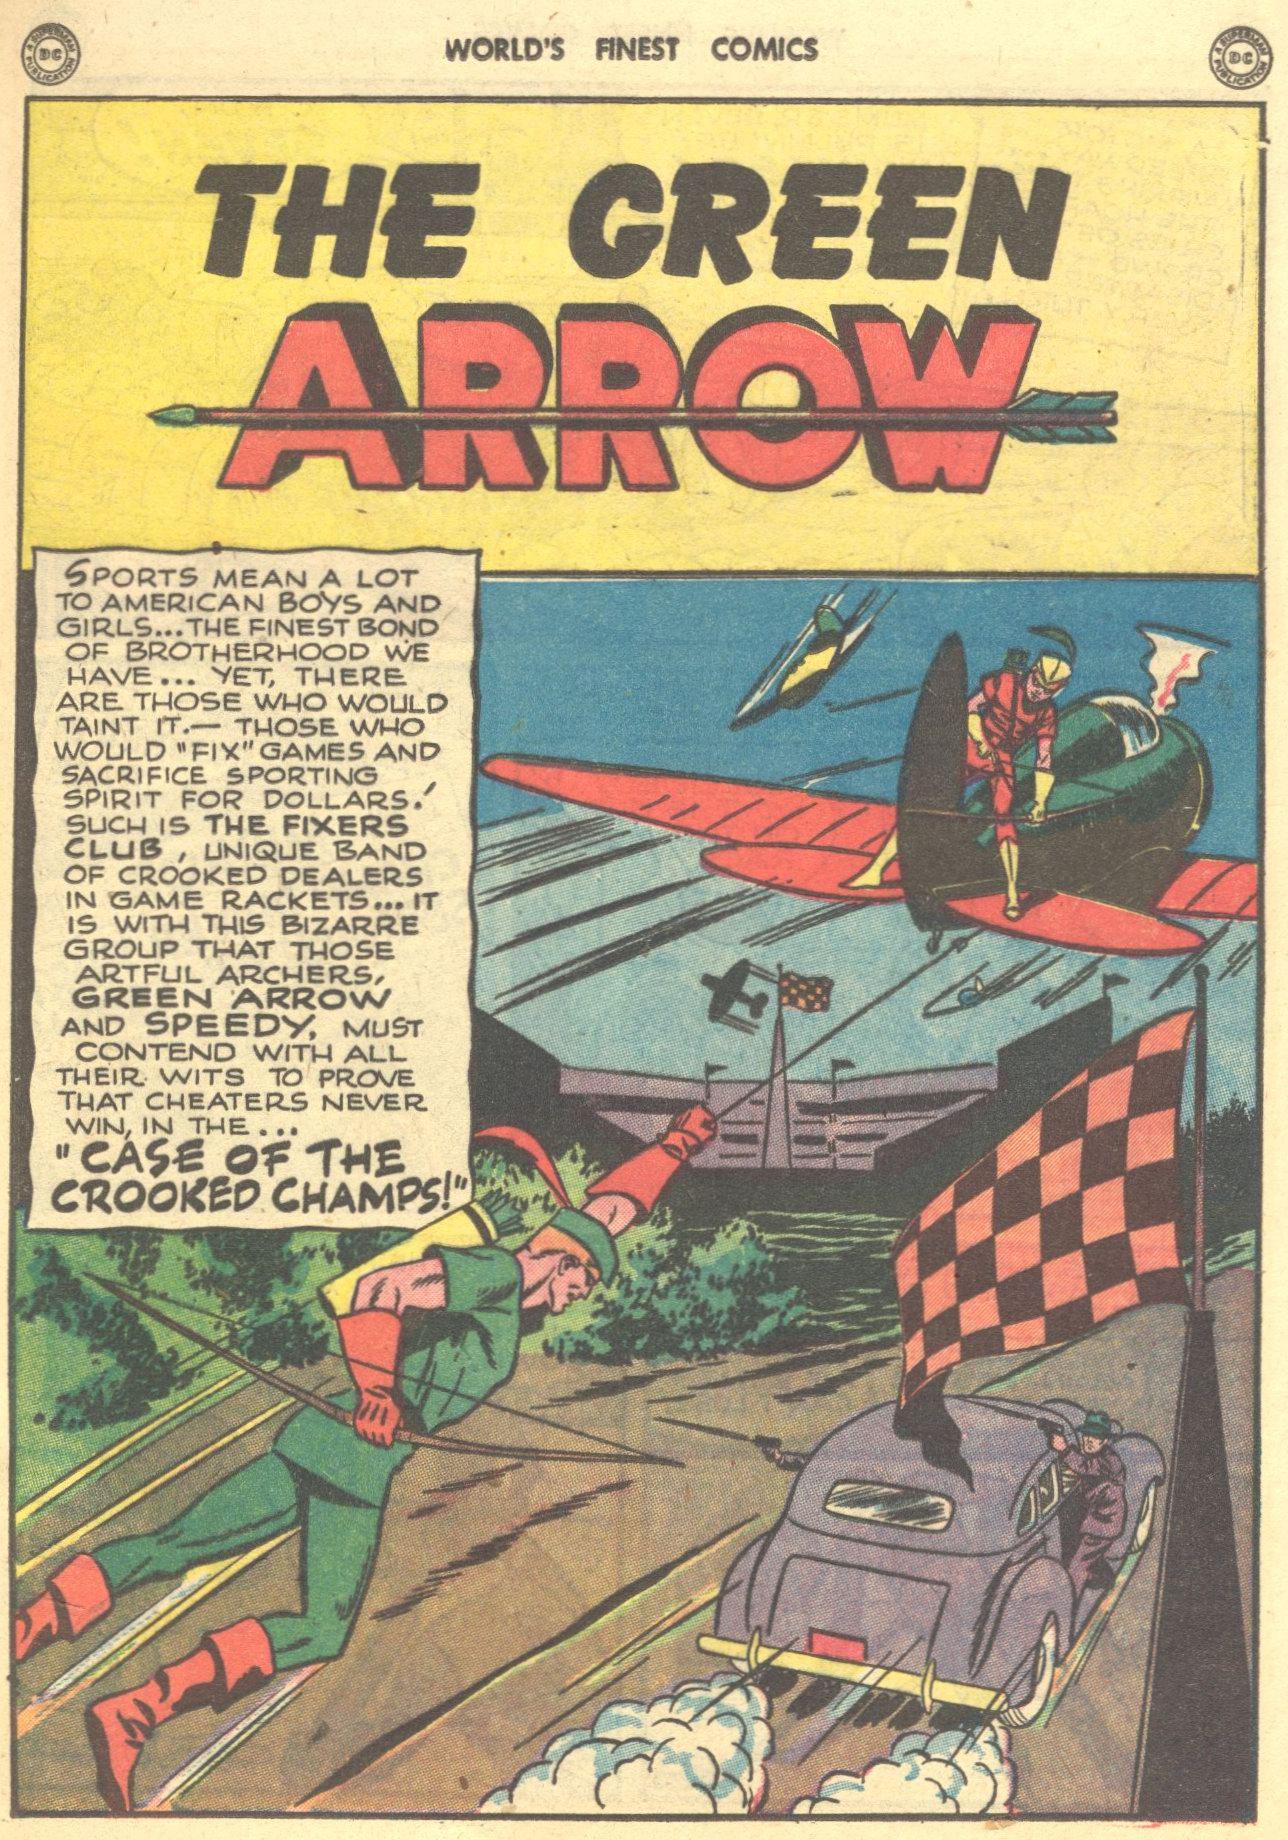 Read online World's Finest Comics comic -  Issue #28 - 16